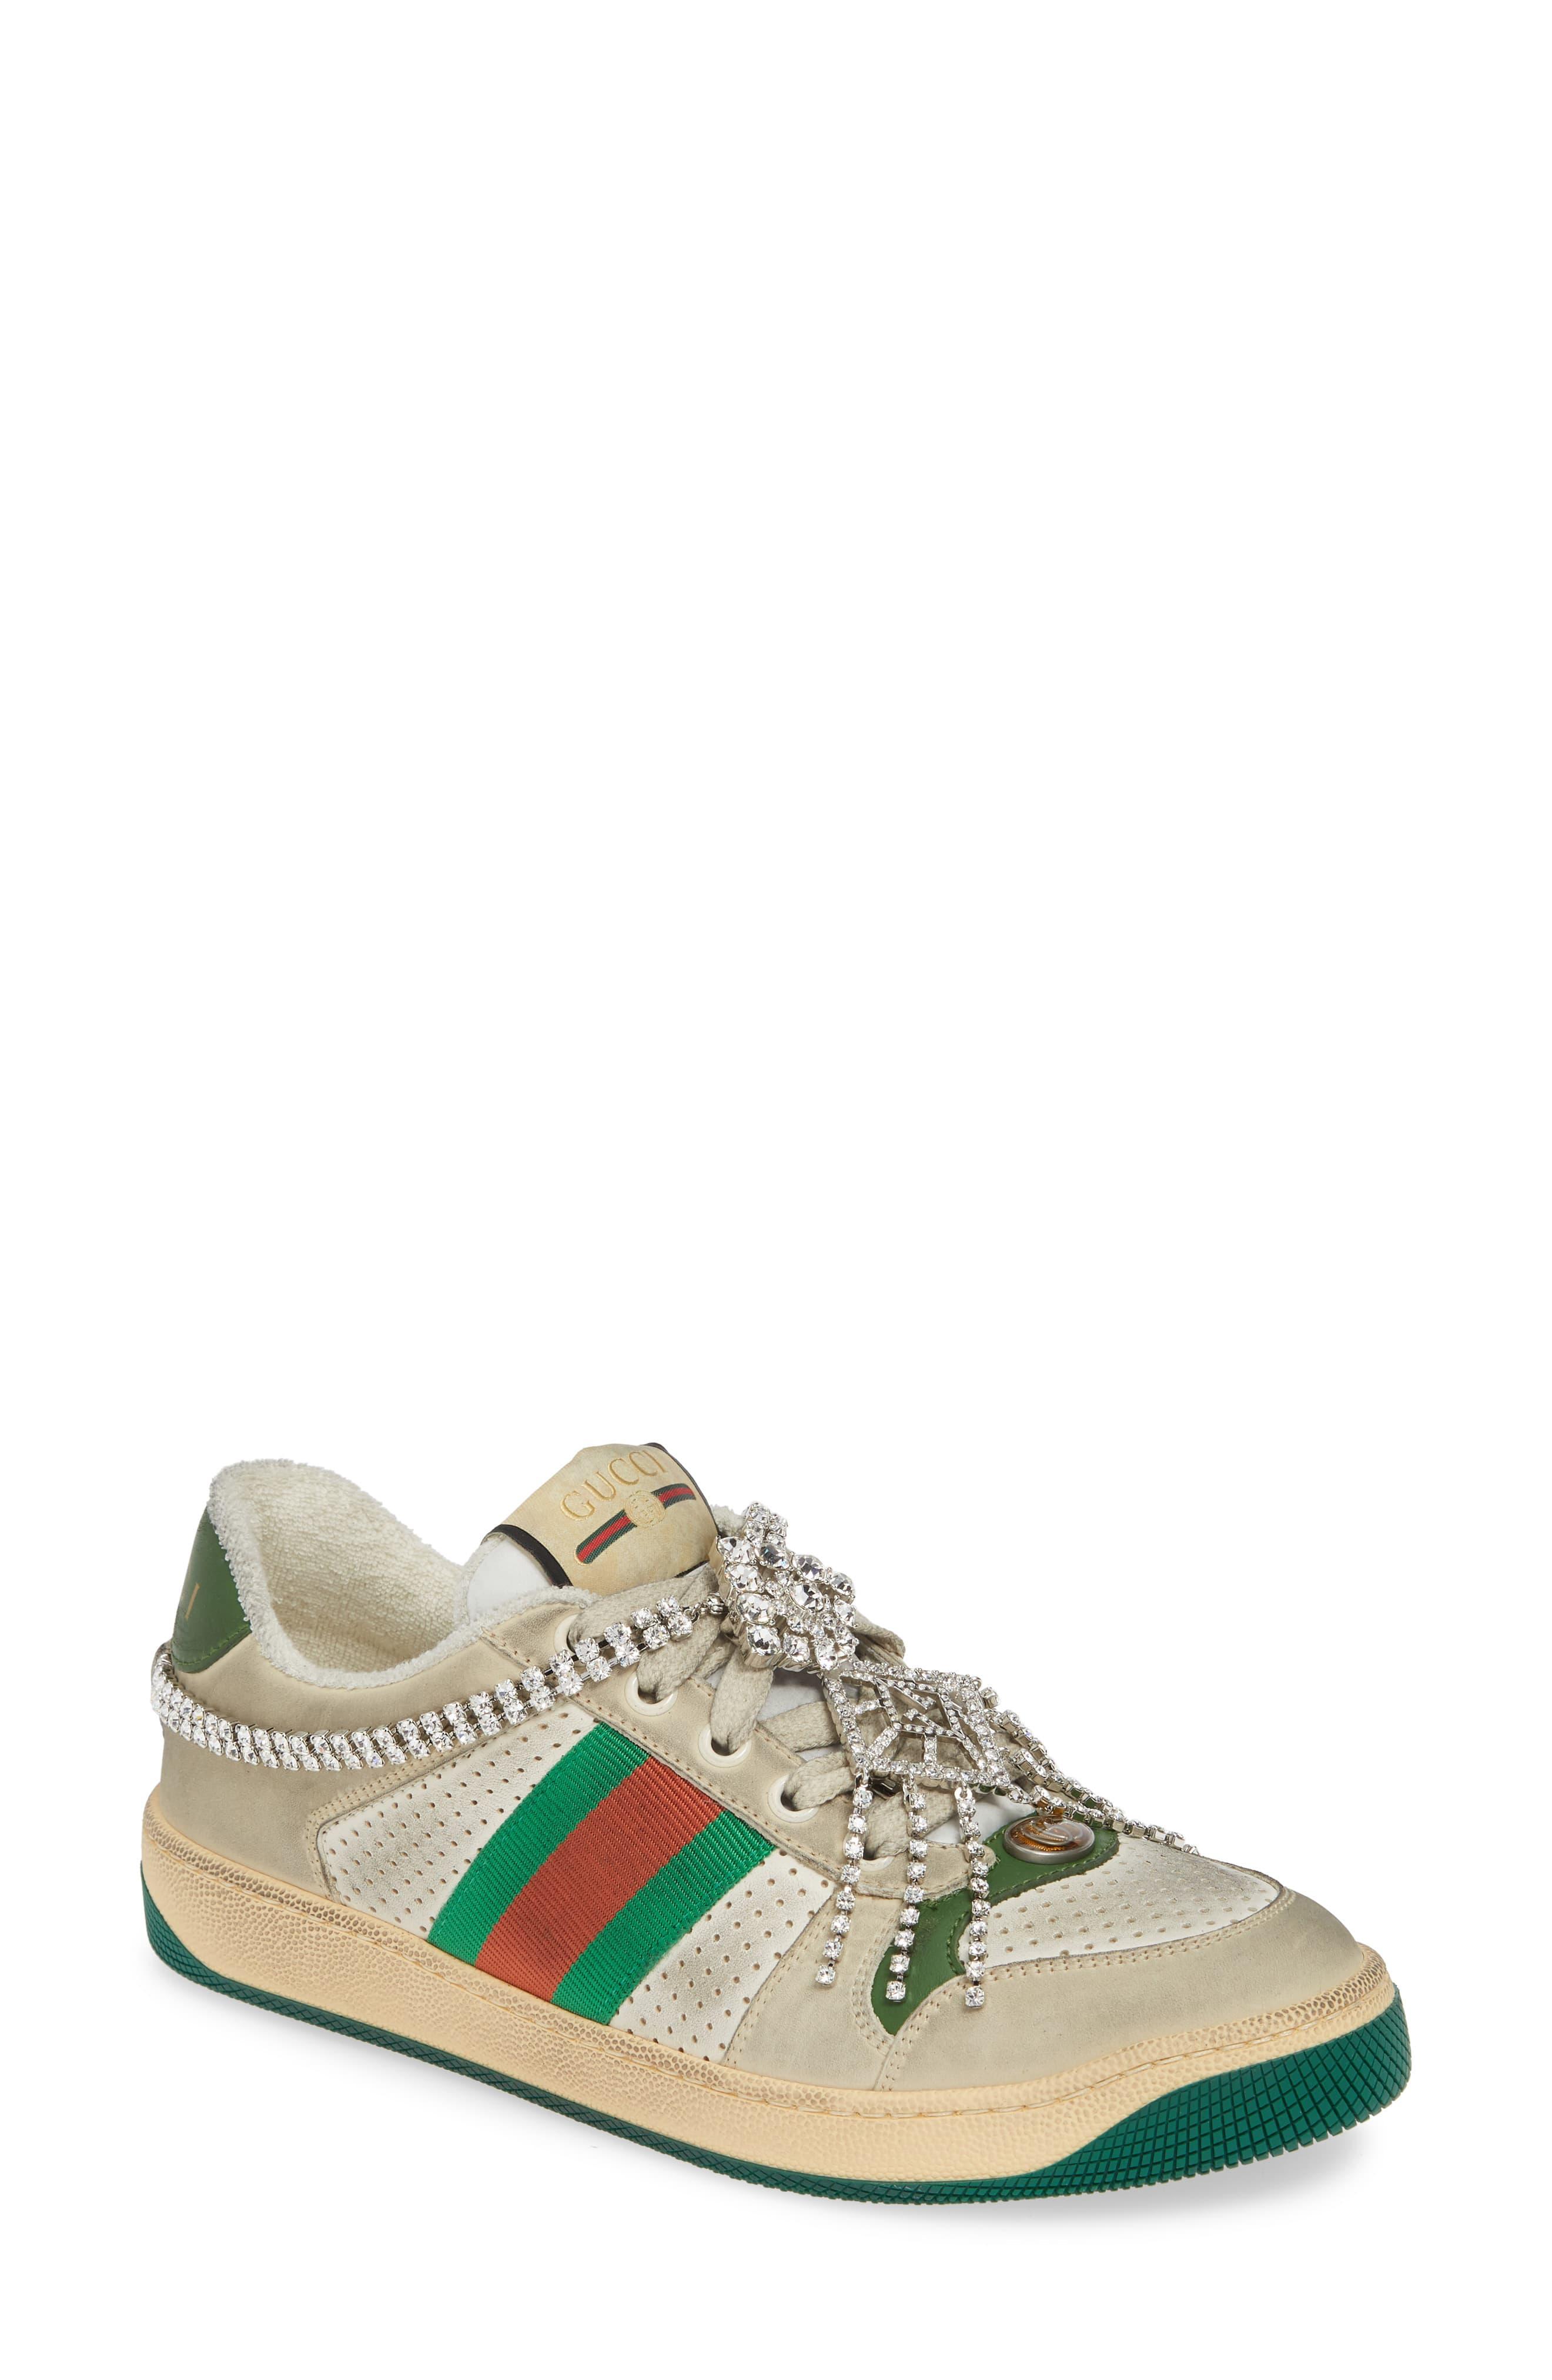 1e7697b0f Women's Gucci Screener Jeweled Low Top Sneaker, Size 10.5US / 40.5EU - Beige